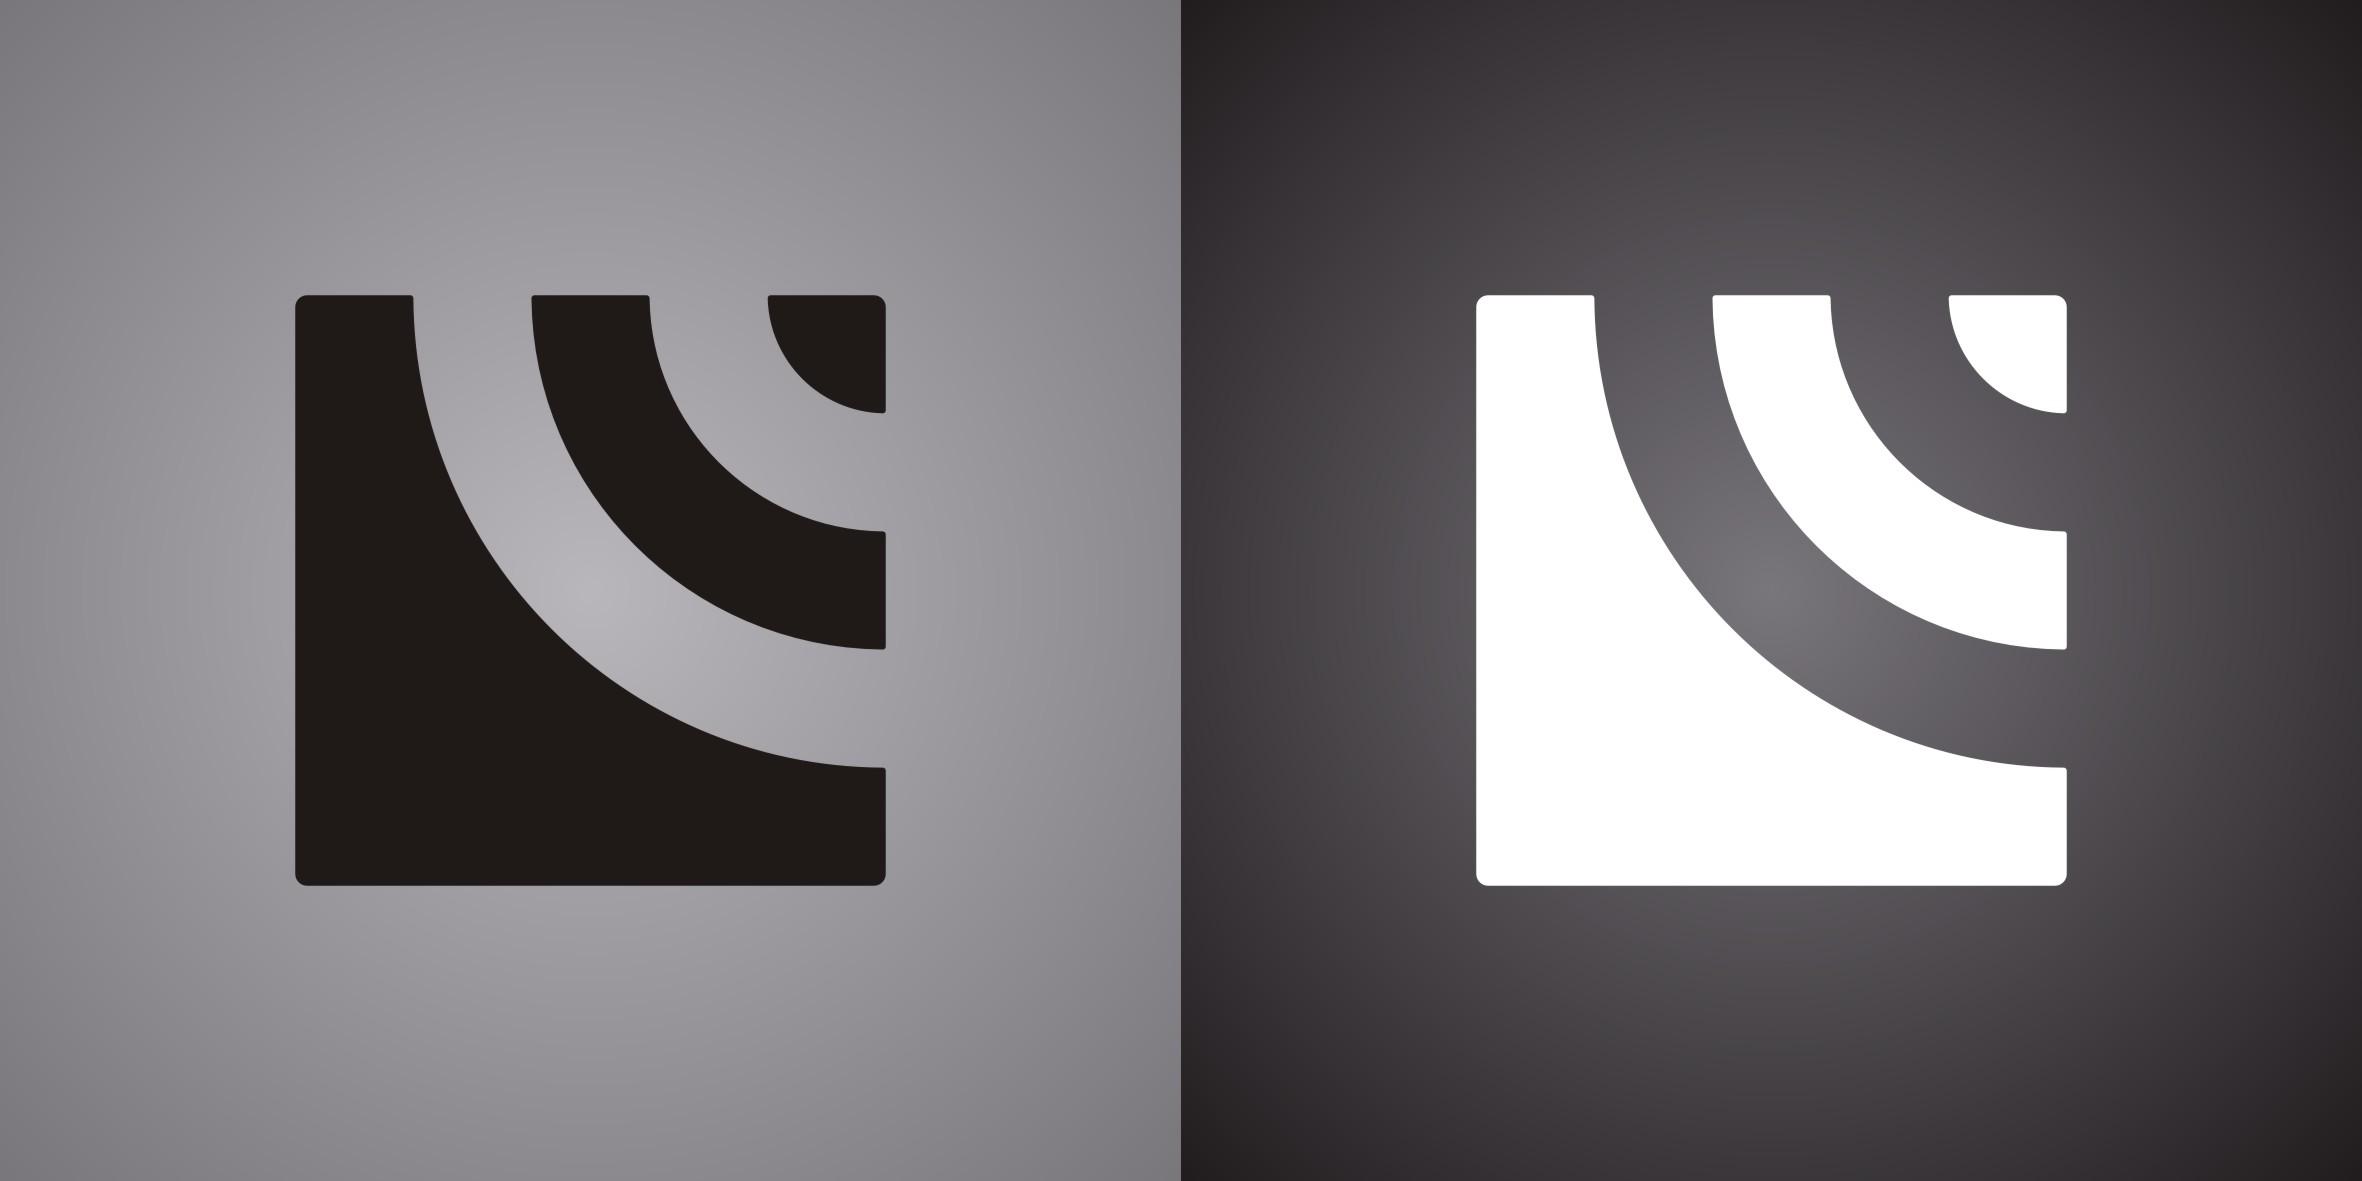 Разработка логотипа и фирменного стиля для КБ Прибой фото f_7825b2be1d6b3c24.jpg